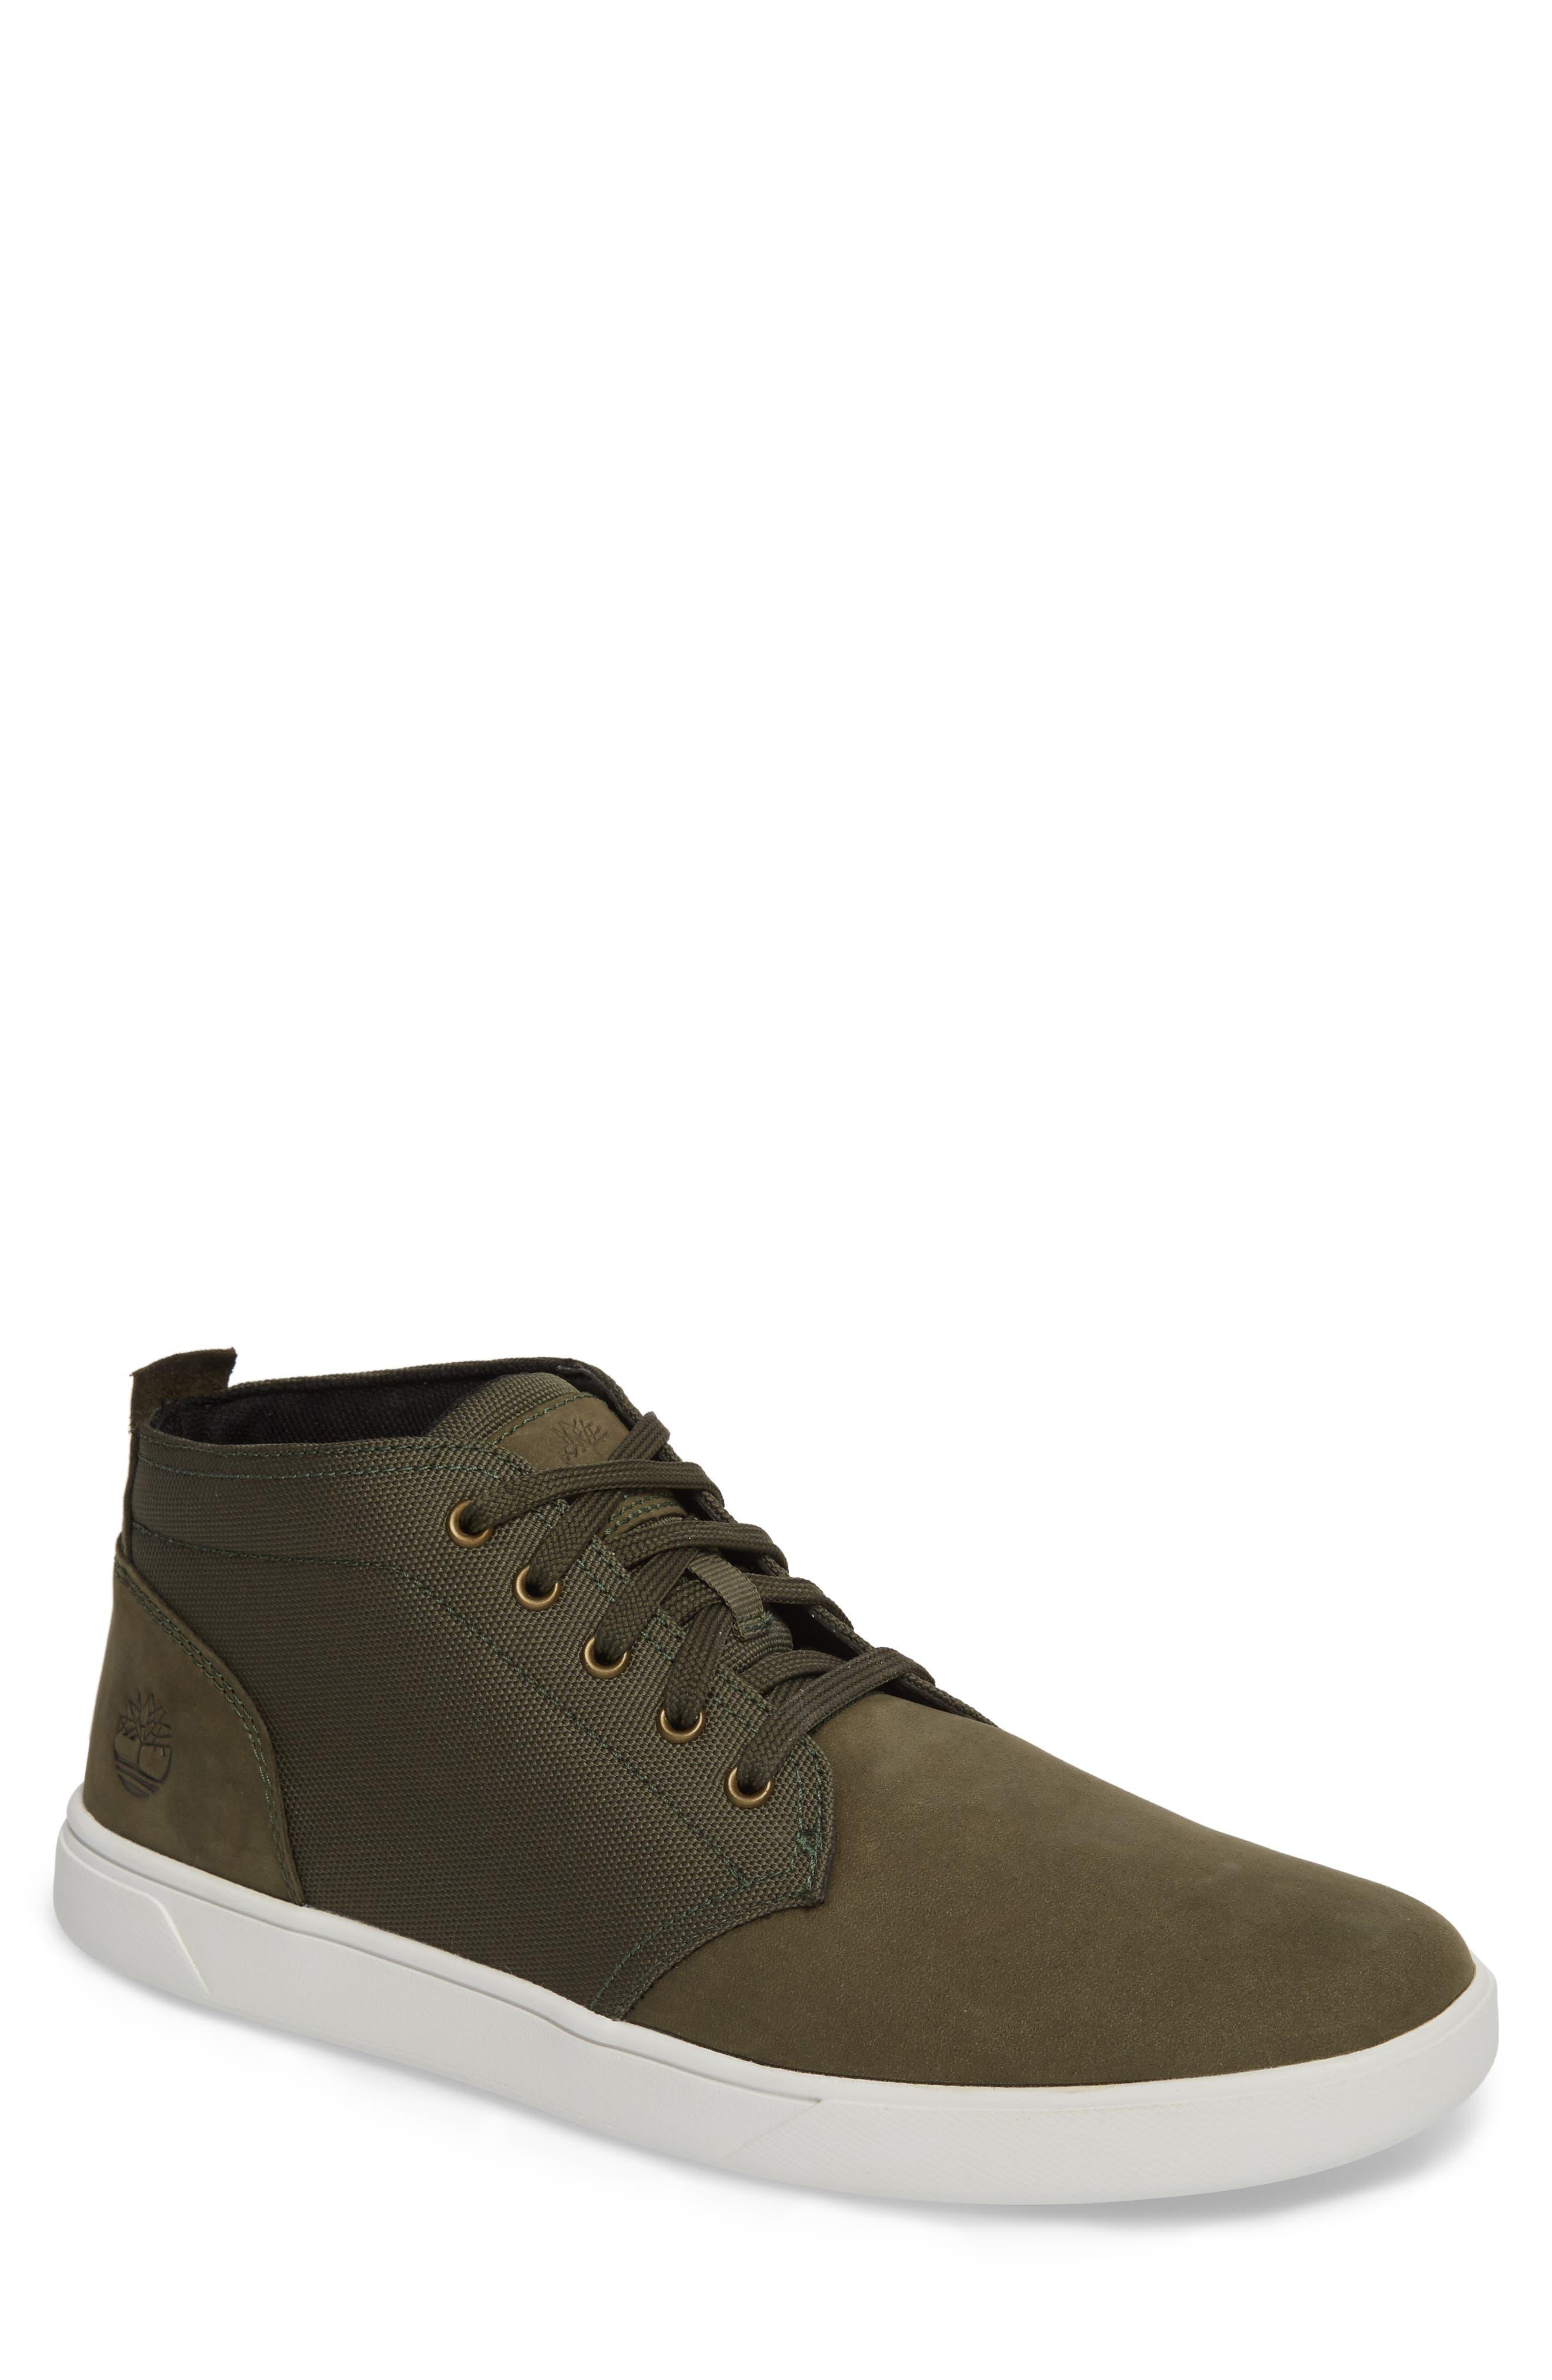 Earthkeepers<sup>®</sup> 'Groveton' Chukka Sneaker,                             Main thumbnail 1, color,                             Grape Leaf Leather